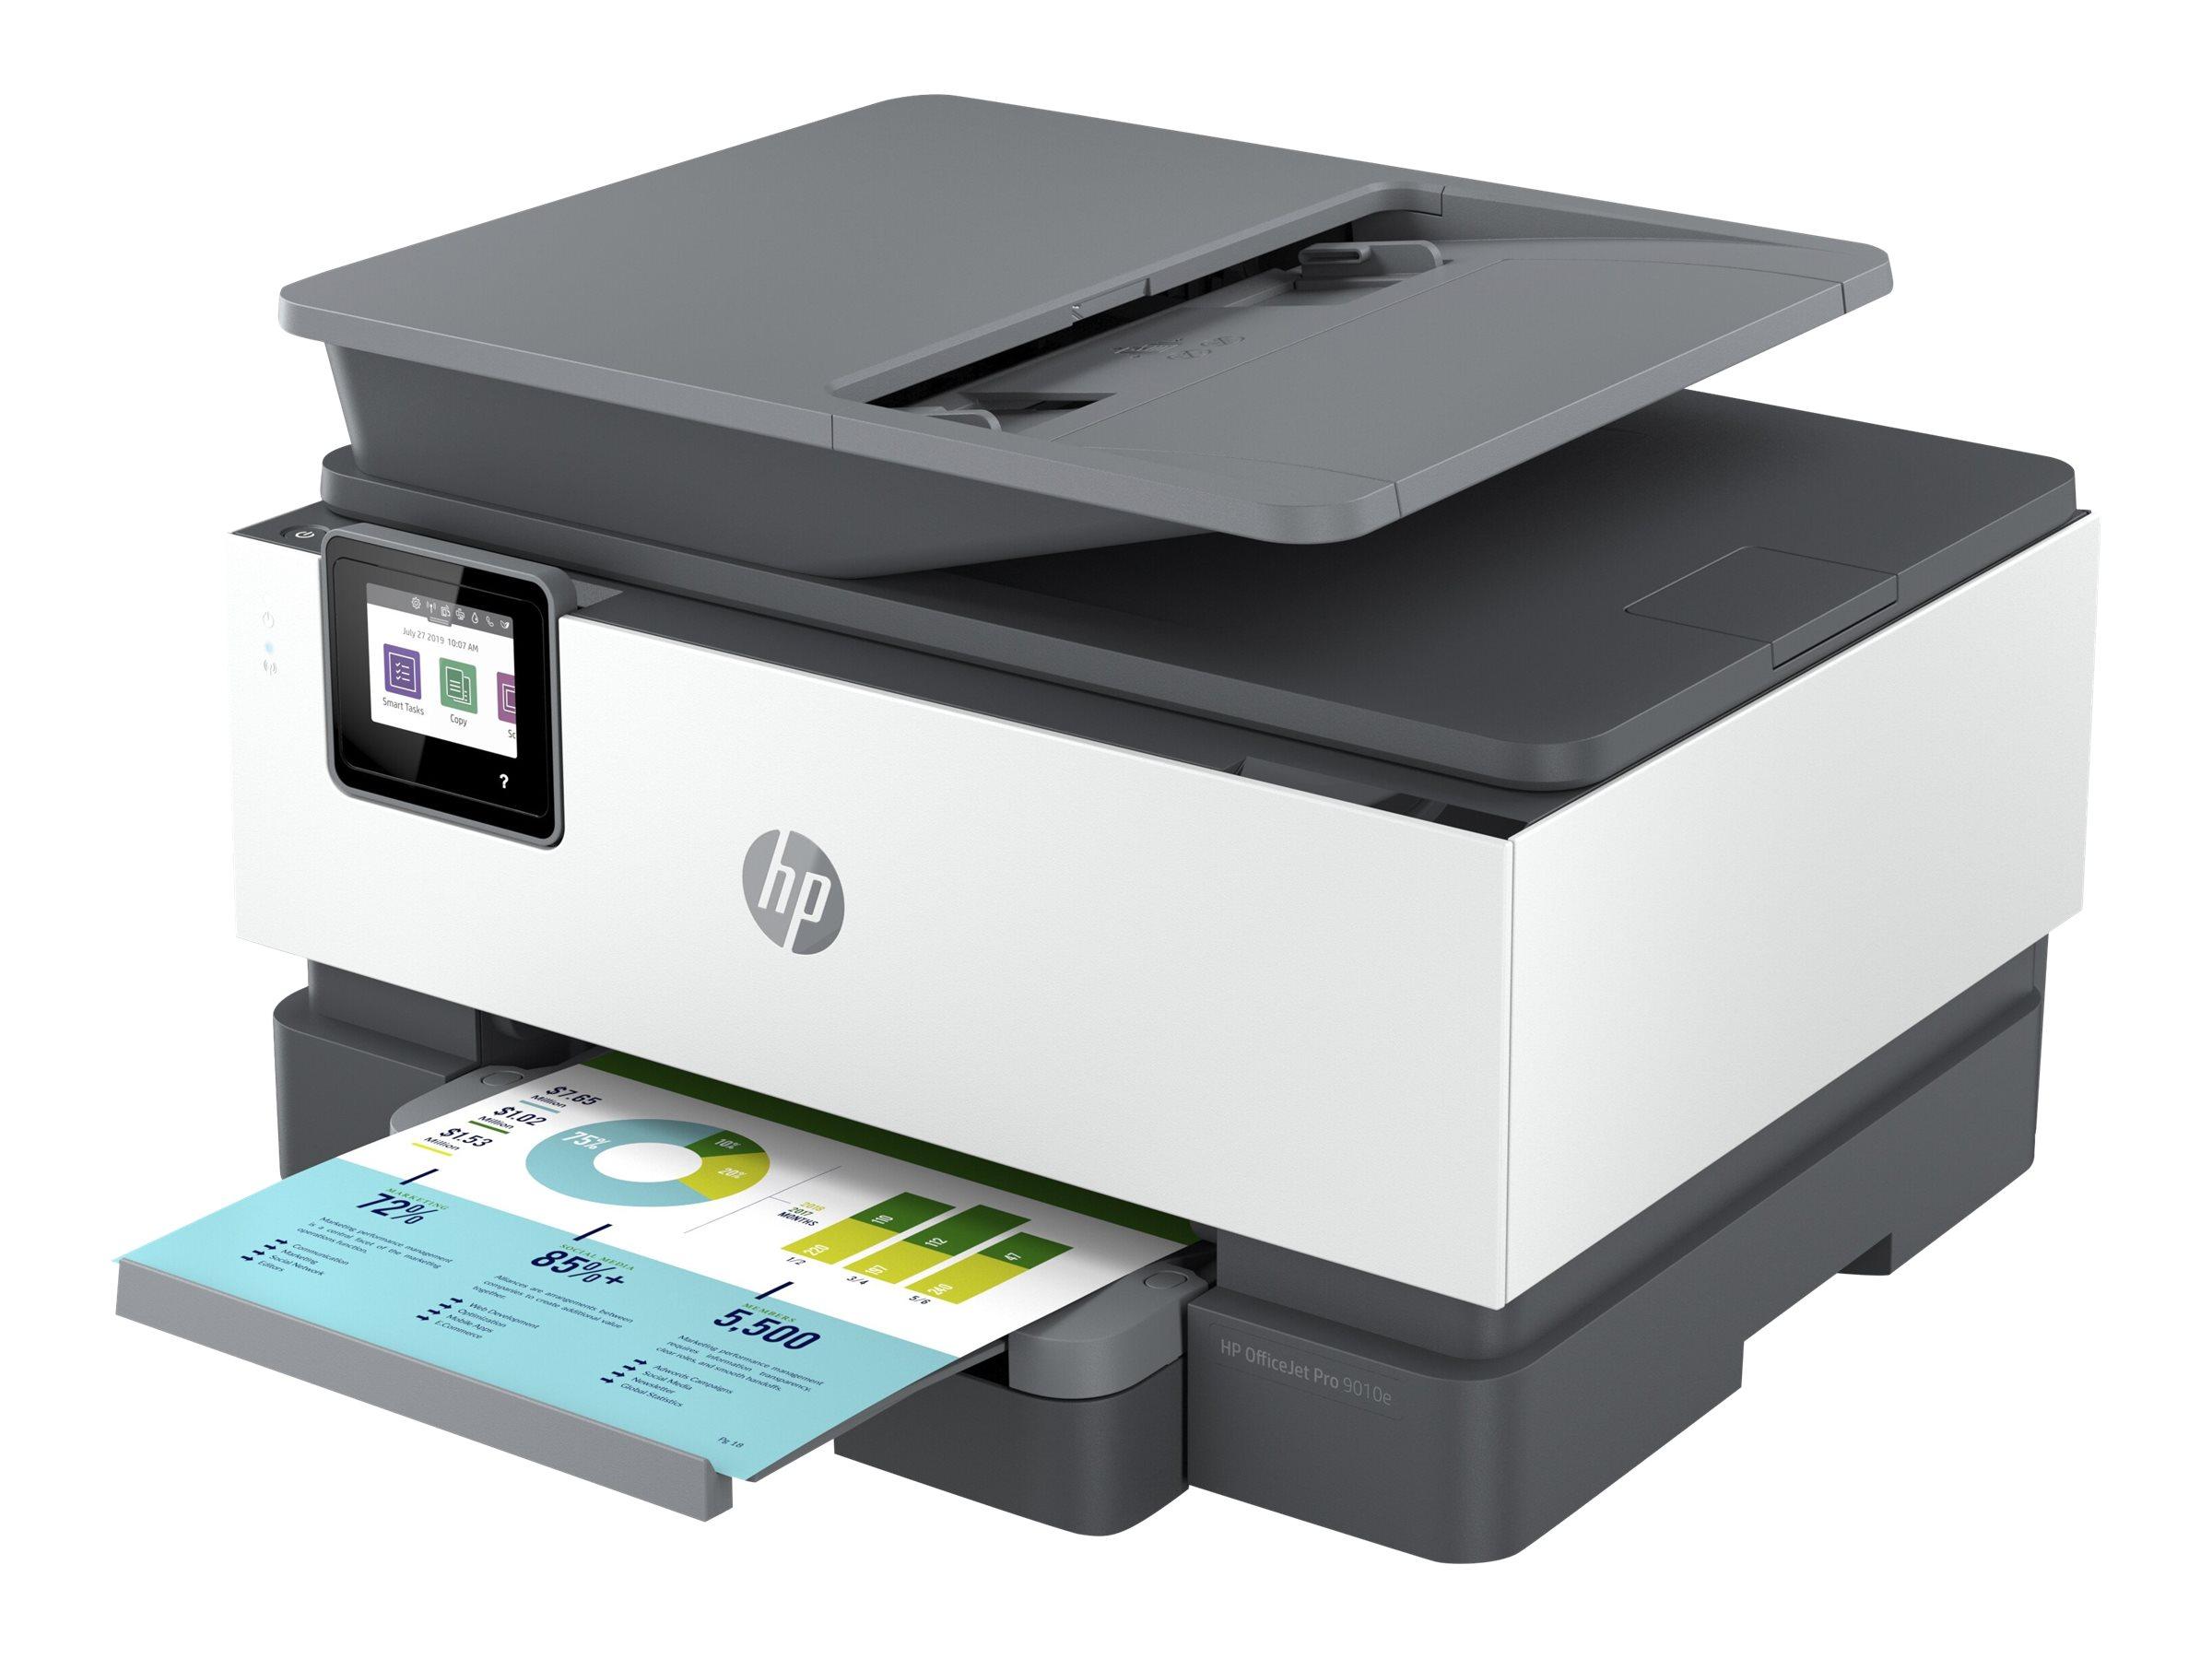 HP Officejet Pro 9010e All-in-One - Multifunktionsdrucker - Farbe - Tintenstrahl - Legal (216 x 356 mm)